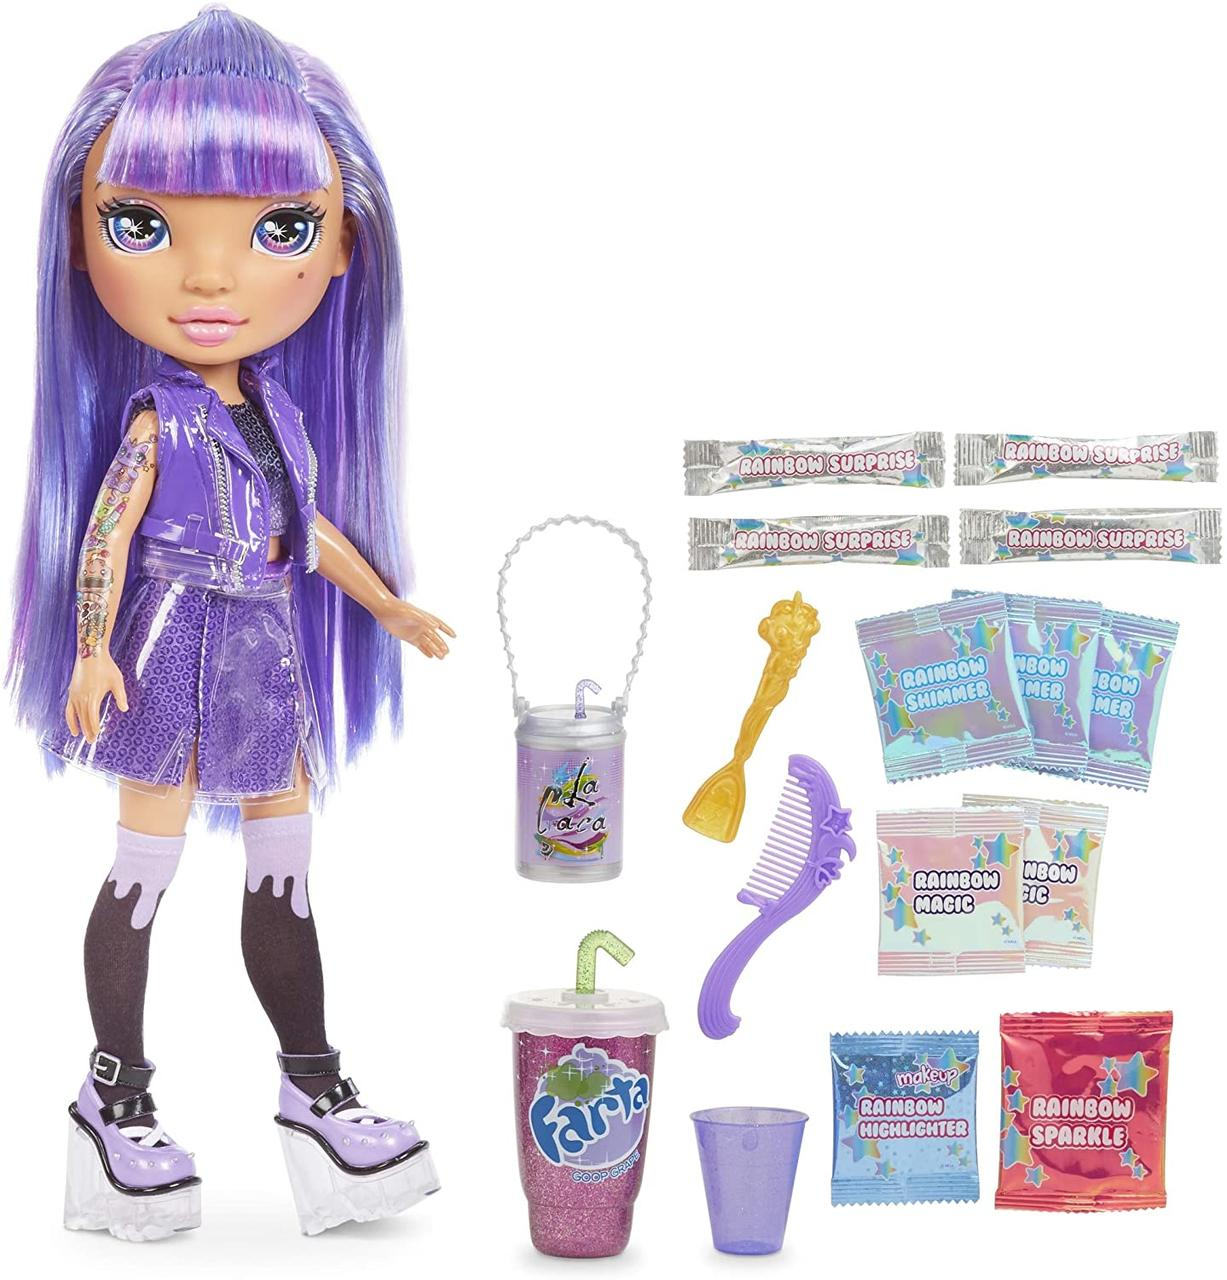 Набор с куклой Пупси Фиолетовая Аметист со слаймами Poopsie Rainbow Surprise Amethyst Оригинал из США